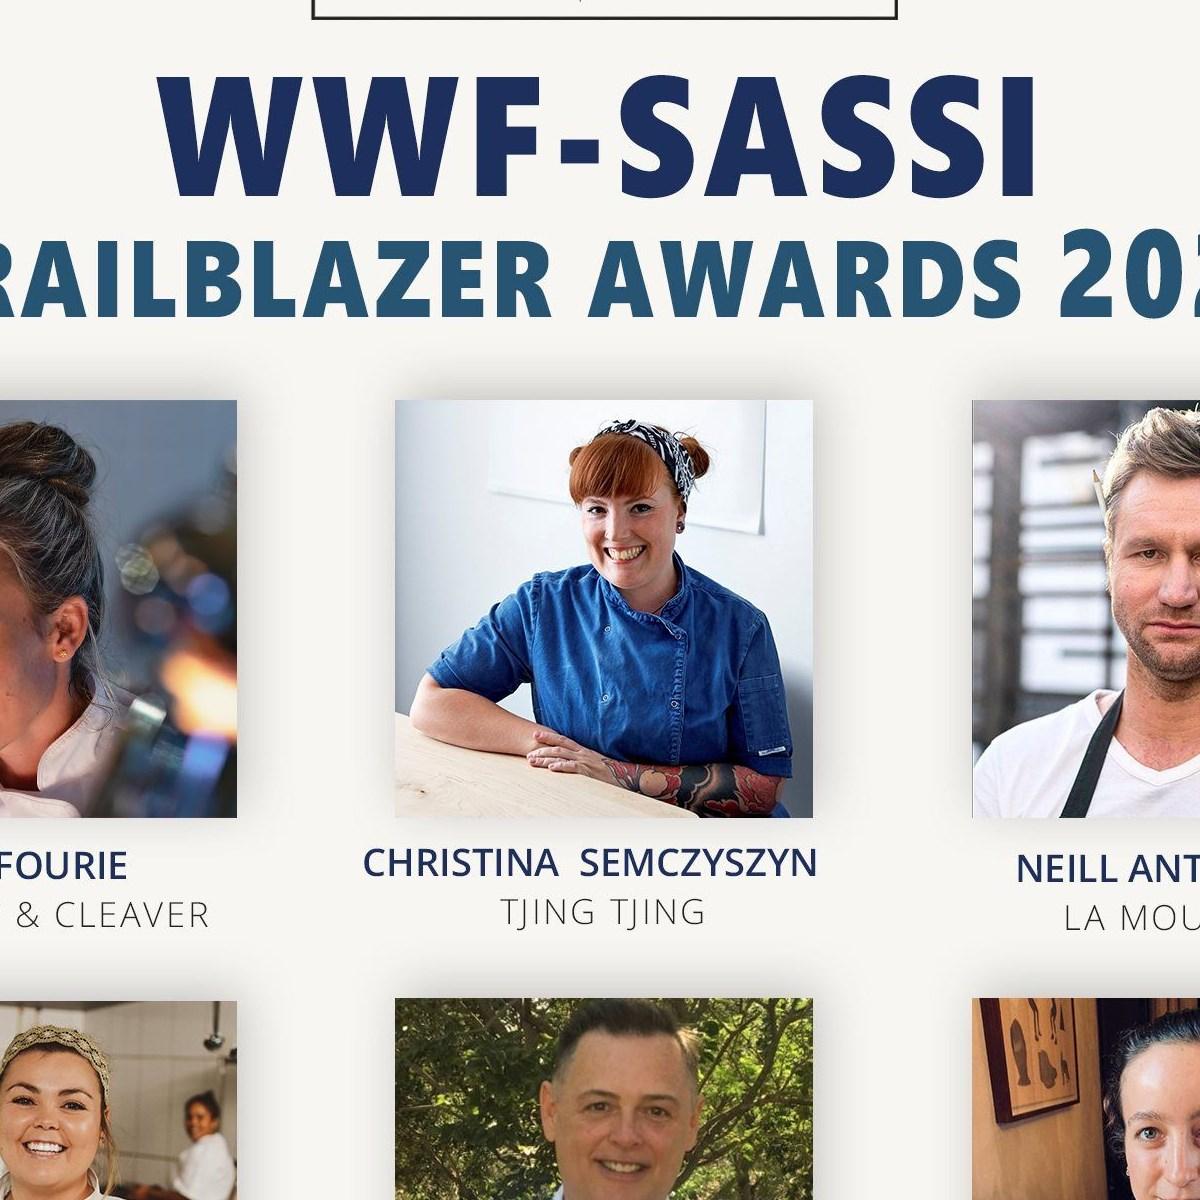 2020 Wwf-sassi Trailblazers Awards Winners Announced photo